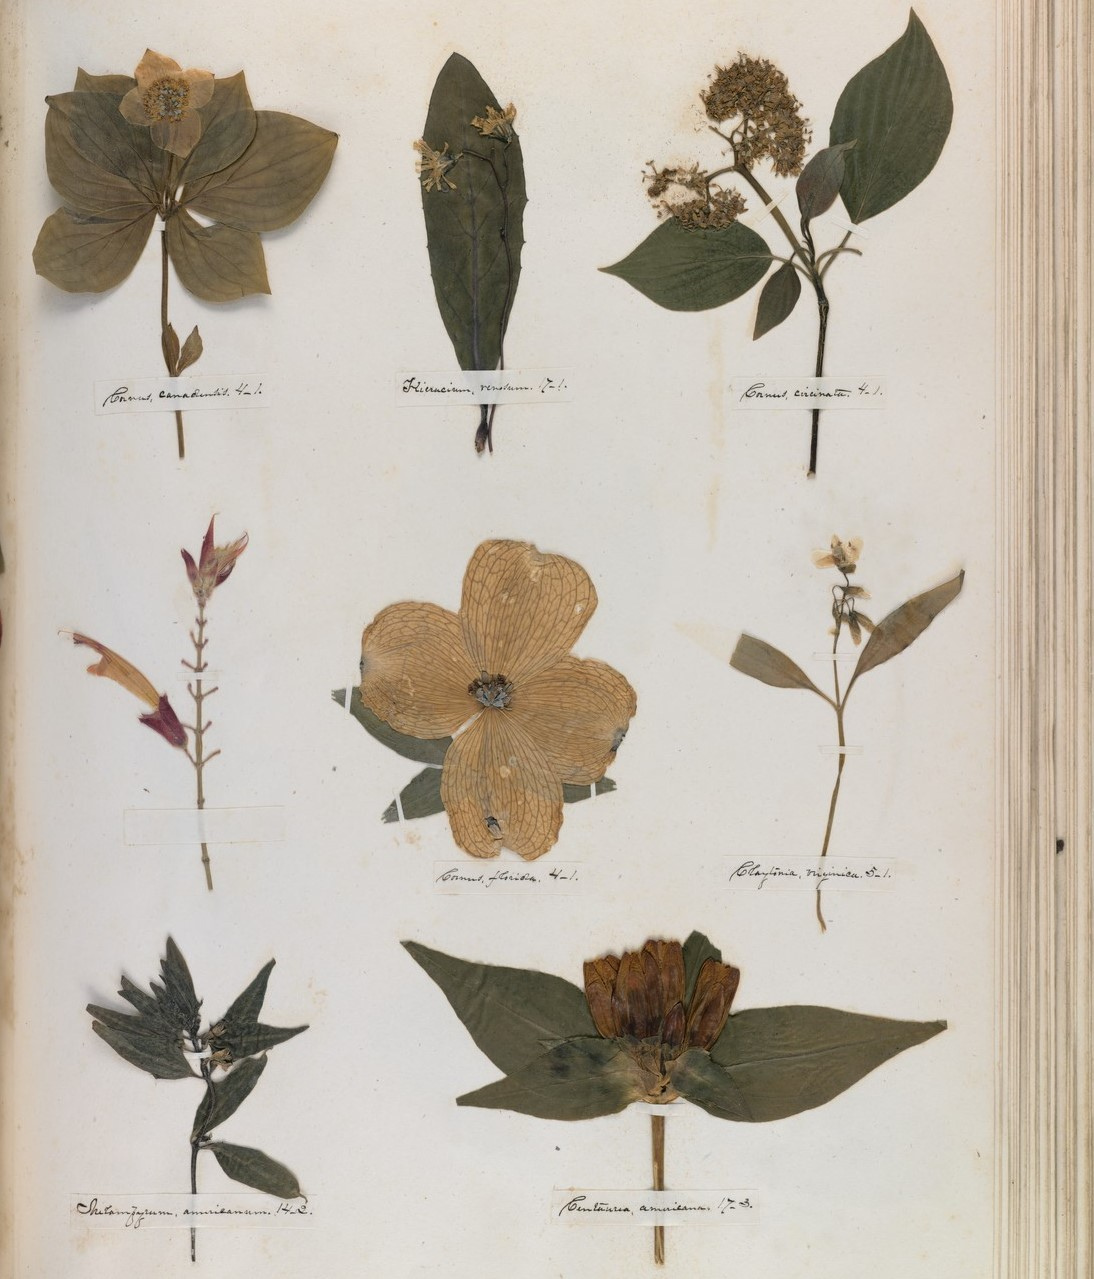 Flores prensadas herbario de Emily Dickinson